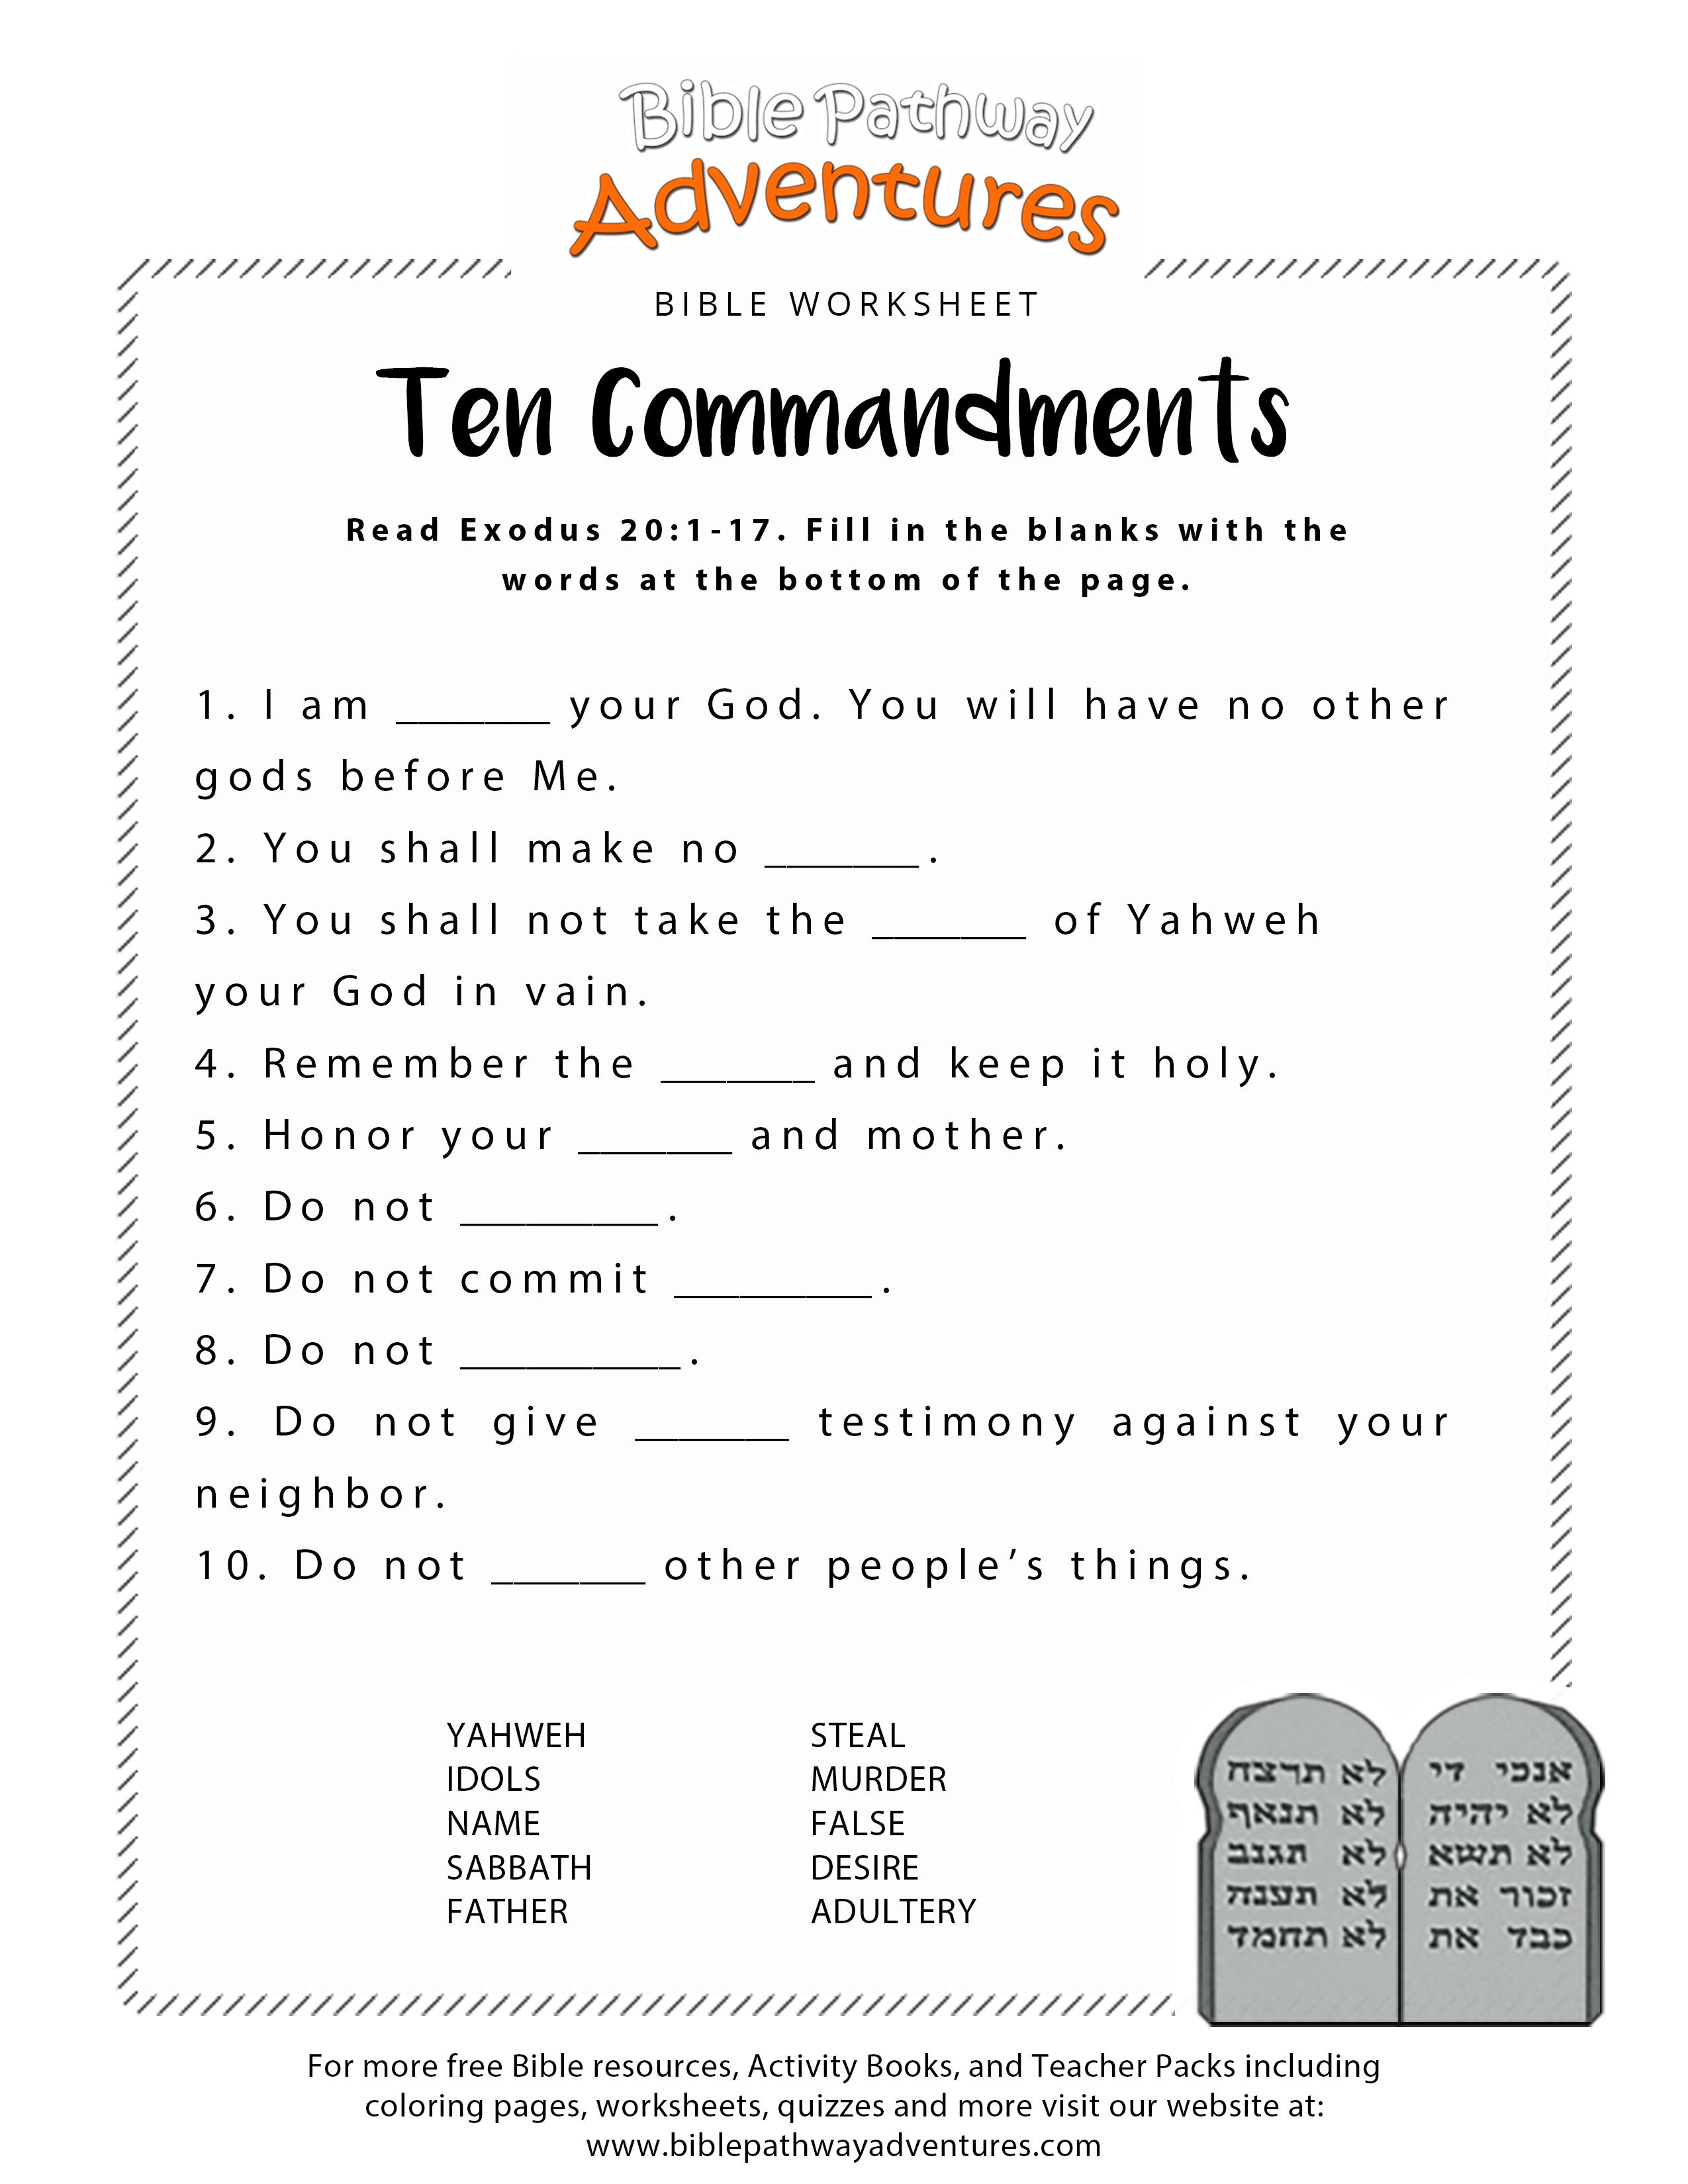 Ten Commandments Worksheet For Kids | Junior Church | Bible - Sunday School Activities Free Printables